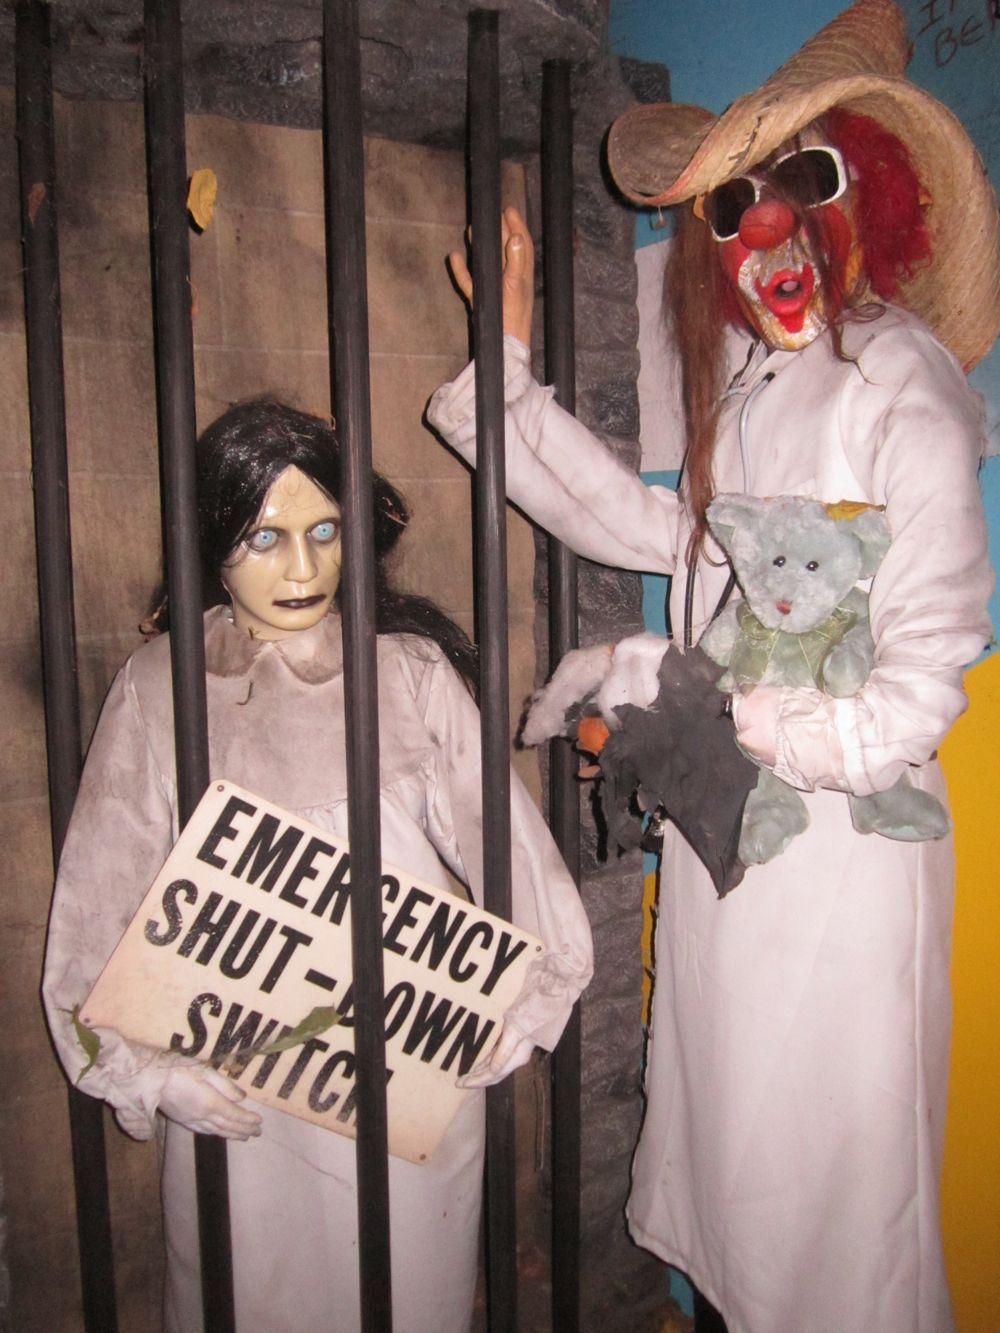 More creepy mannequins.